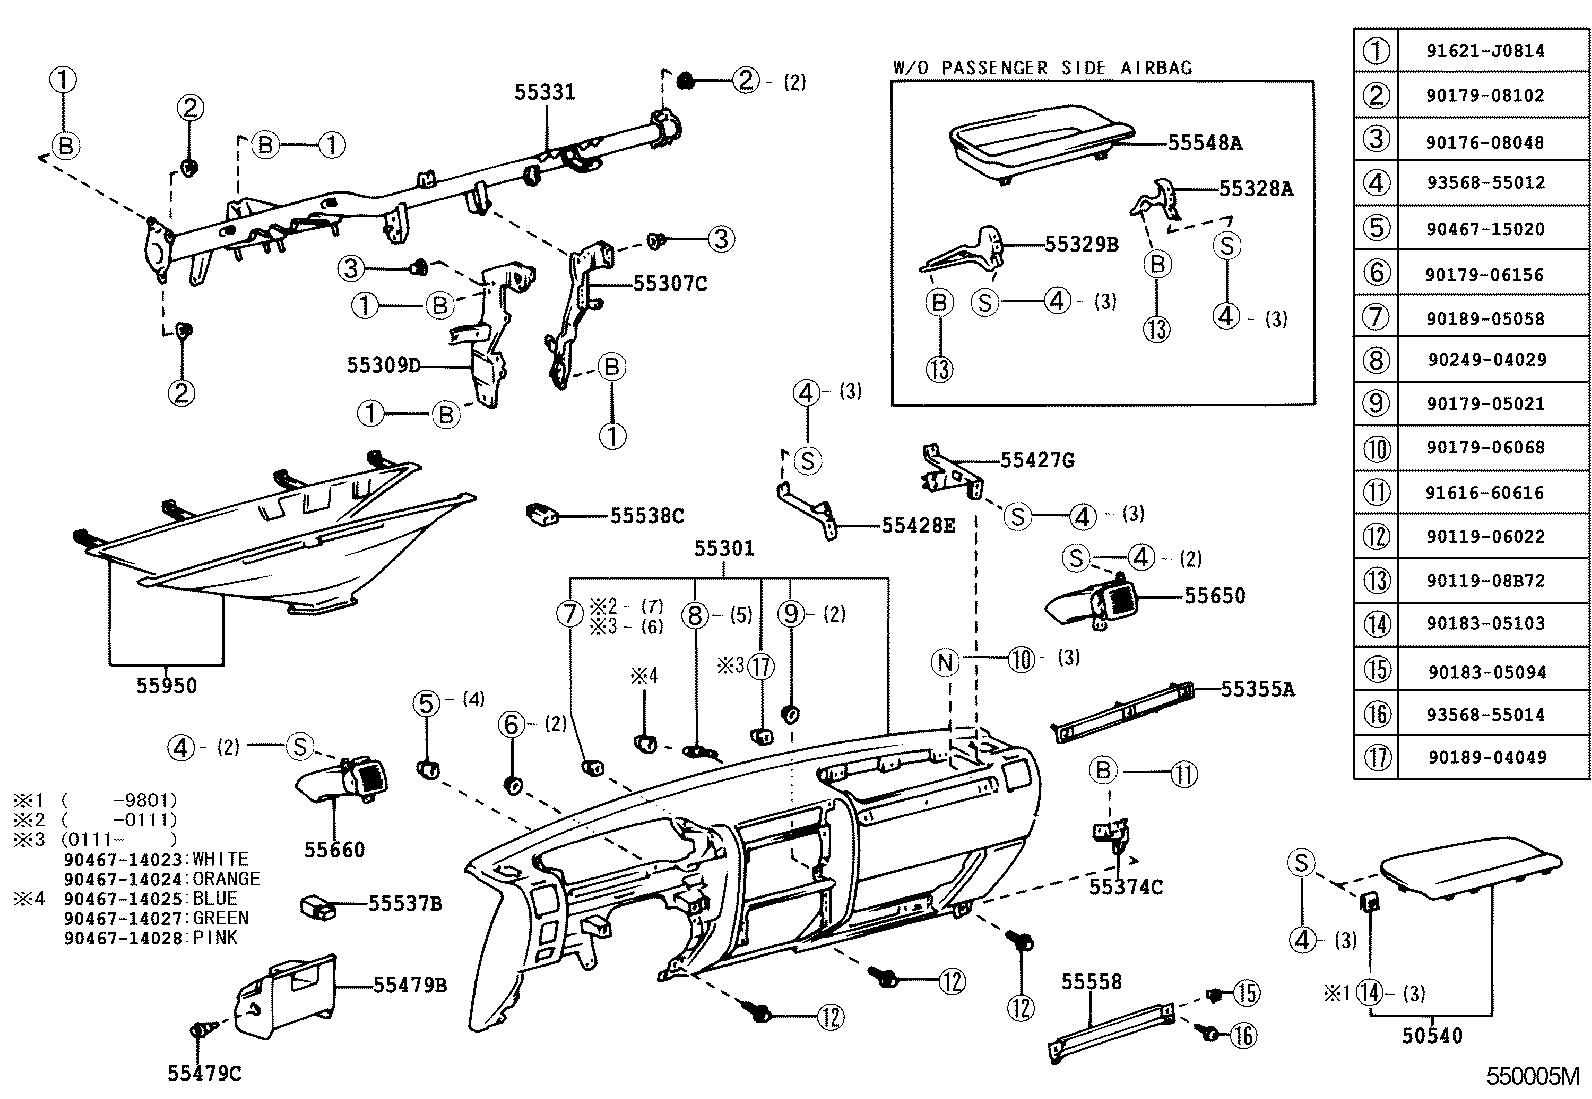 toyota land cruiser 90kzj90l-gjmnx - body